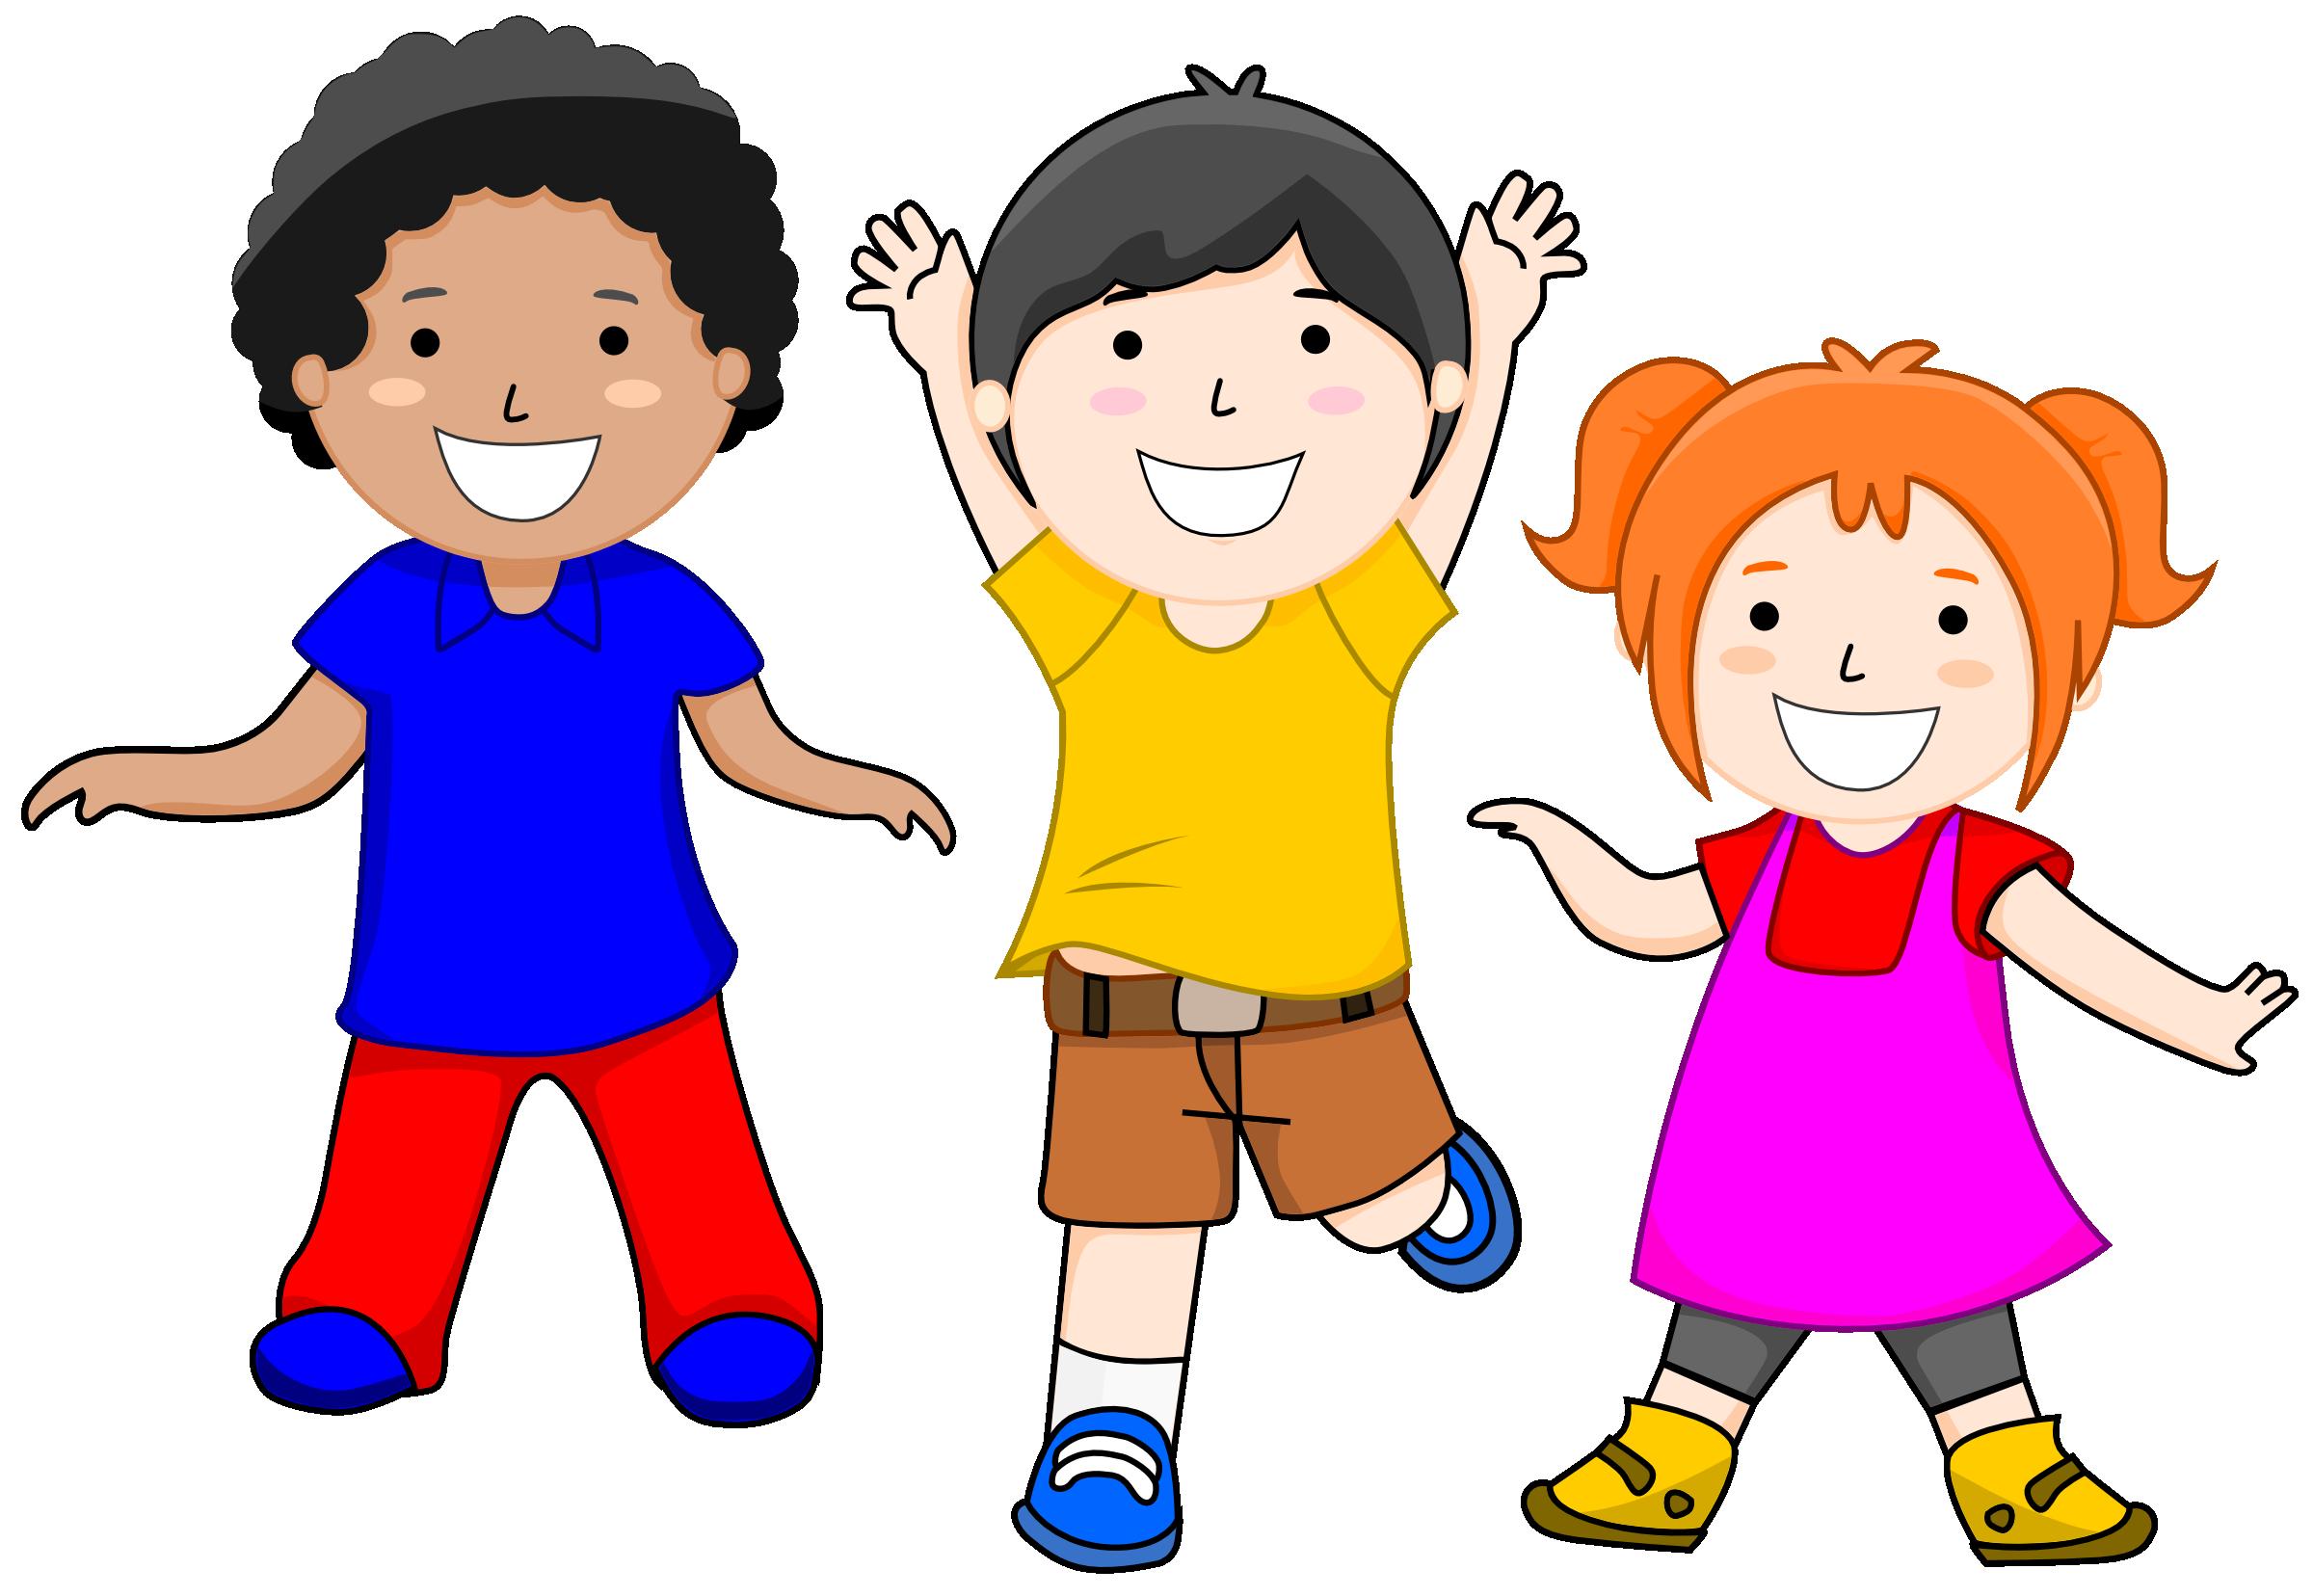 7 children clipart jpg black and white library 31+ Children Playing Clipart | ClipartLook jpg black and white library